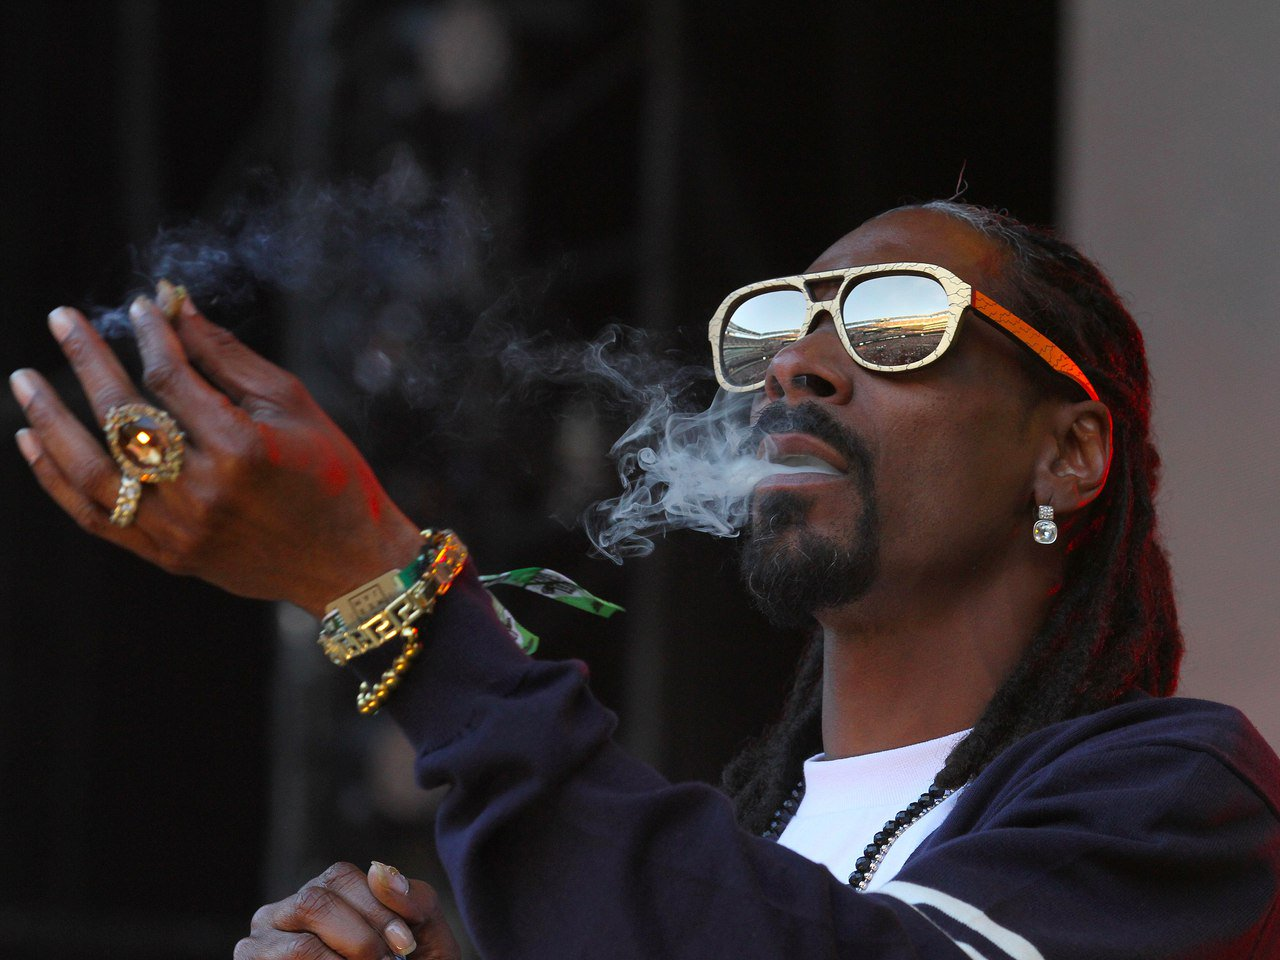 Актер курит марихуану семена канабиса на открытом грунте